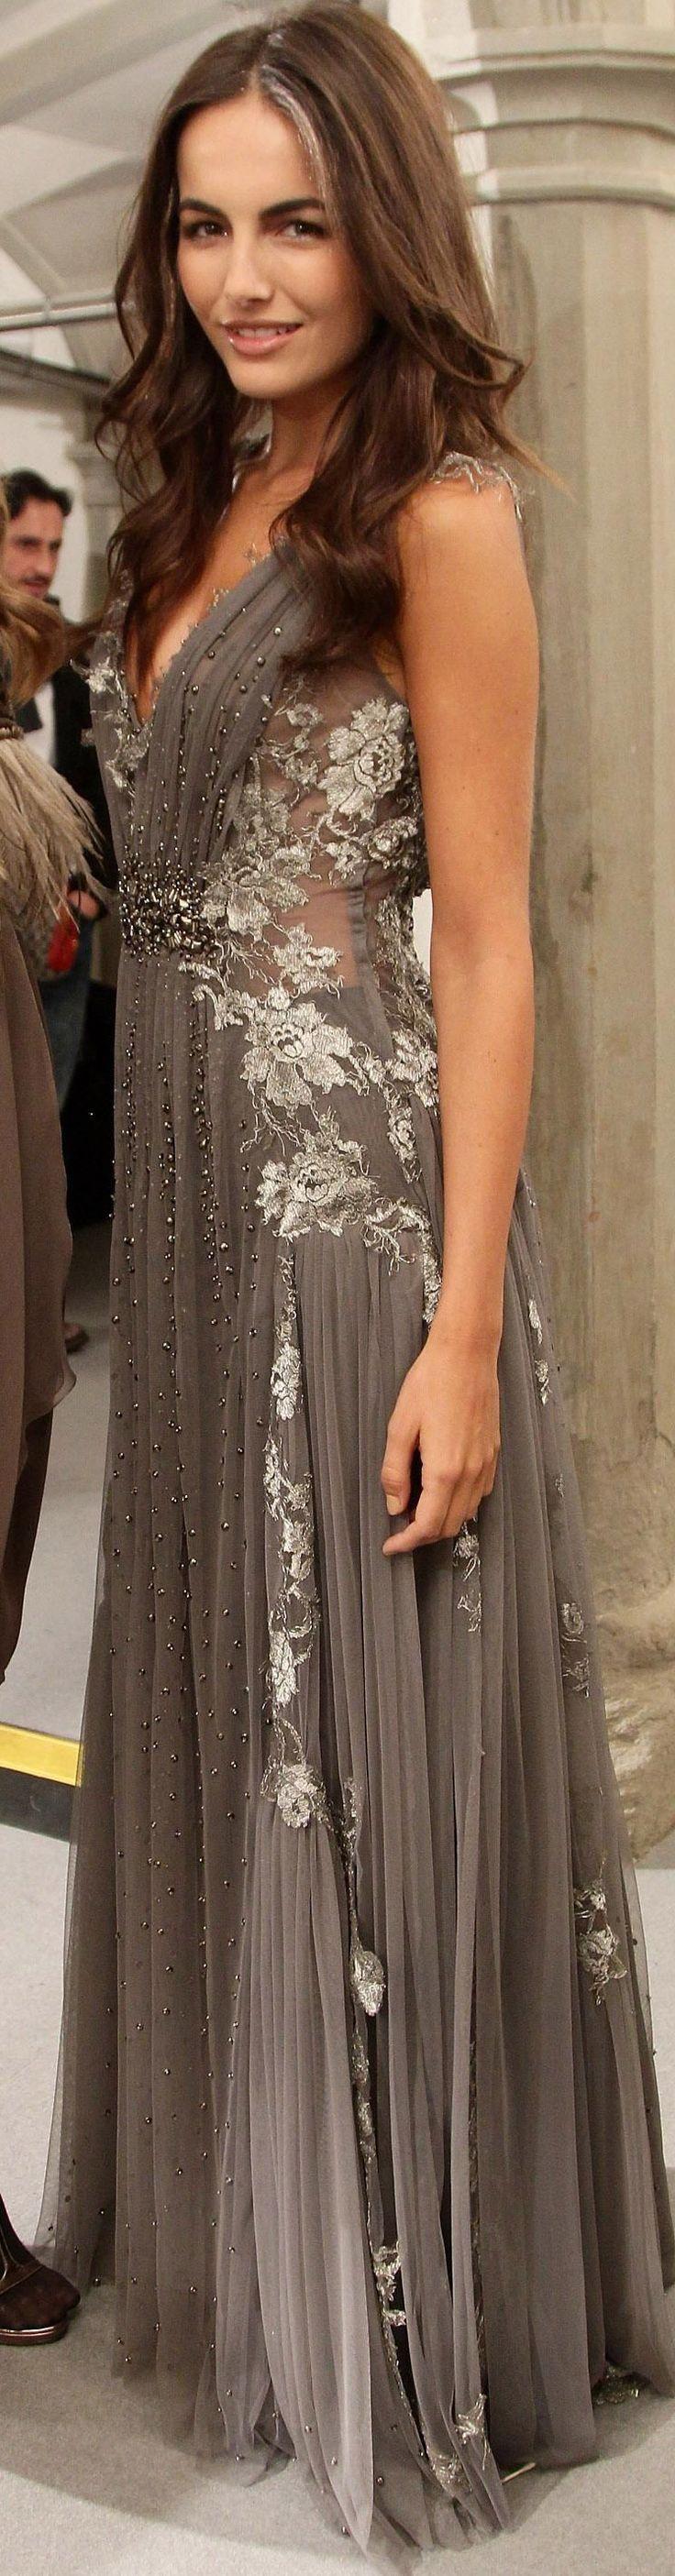 Alberta Ferretti - what a beautiful dress!!